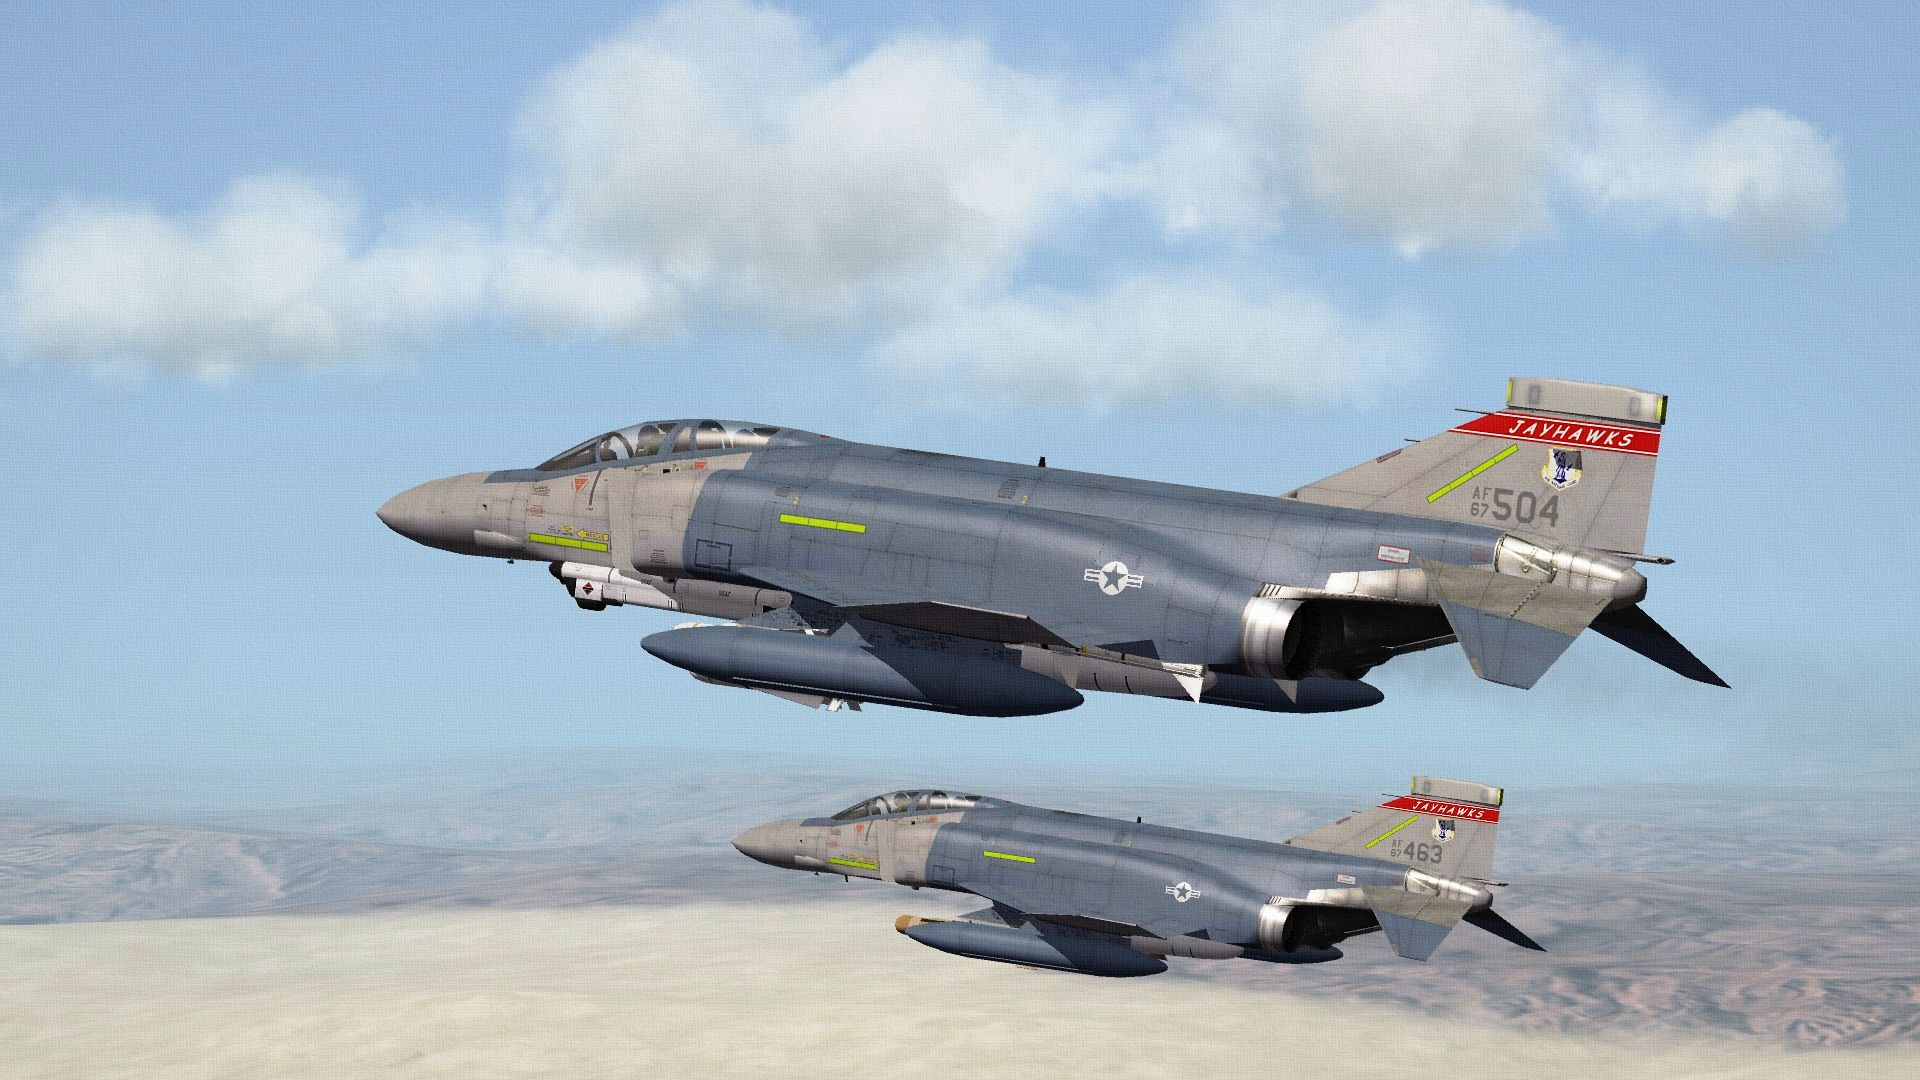 USAFF-4MPHANTOM09_zps17170080.jpg